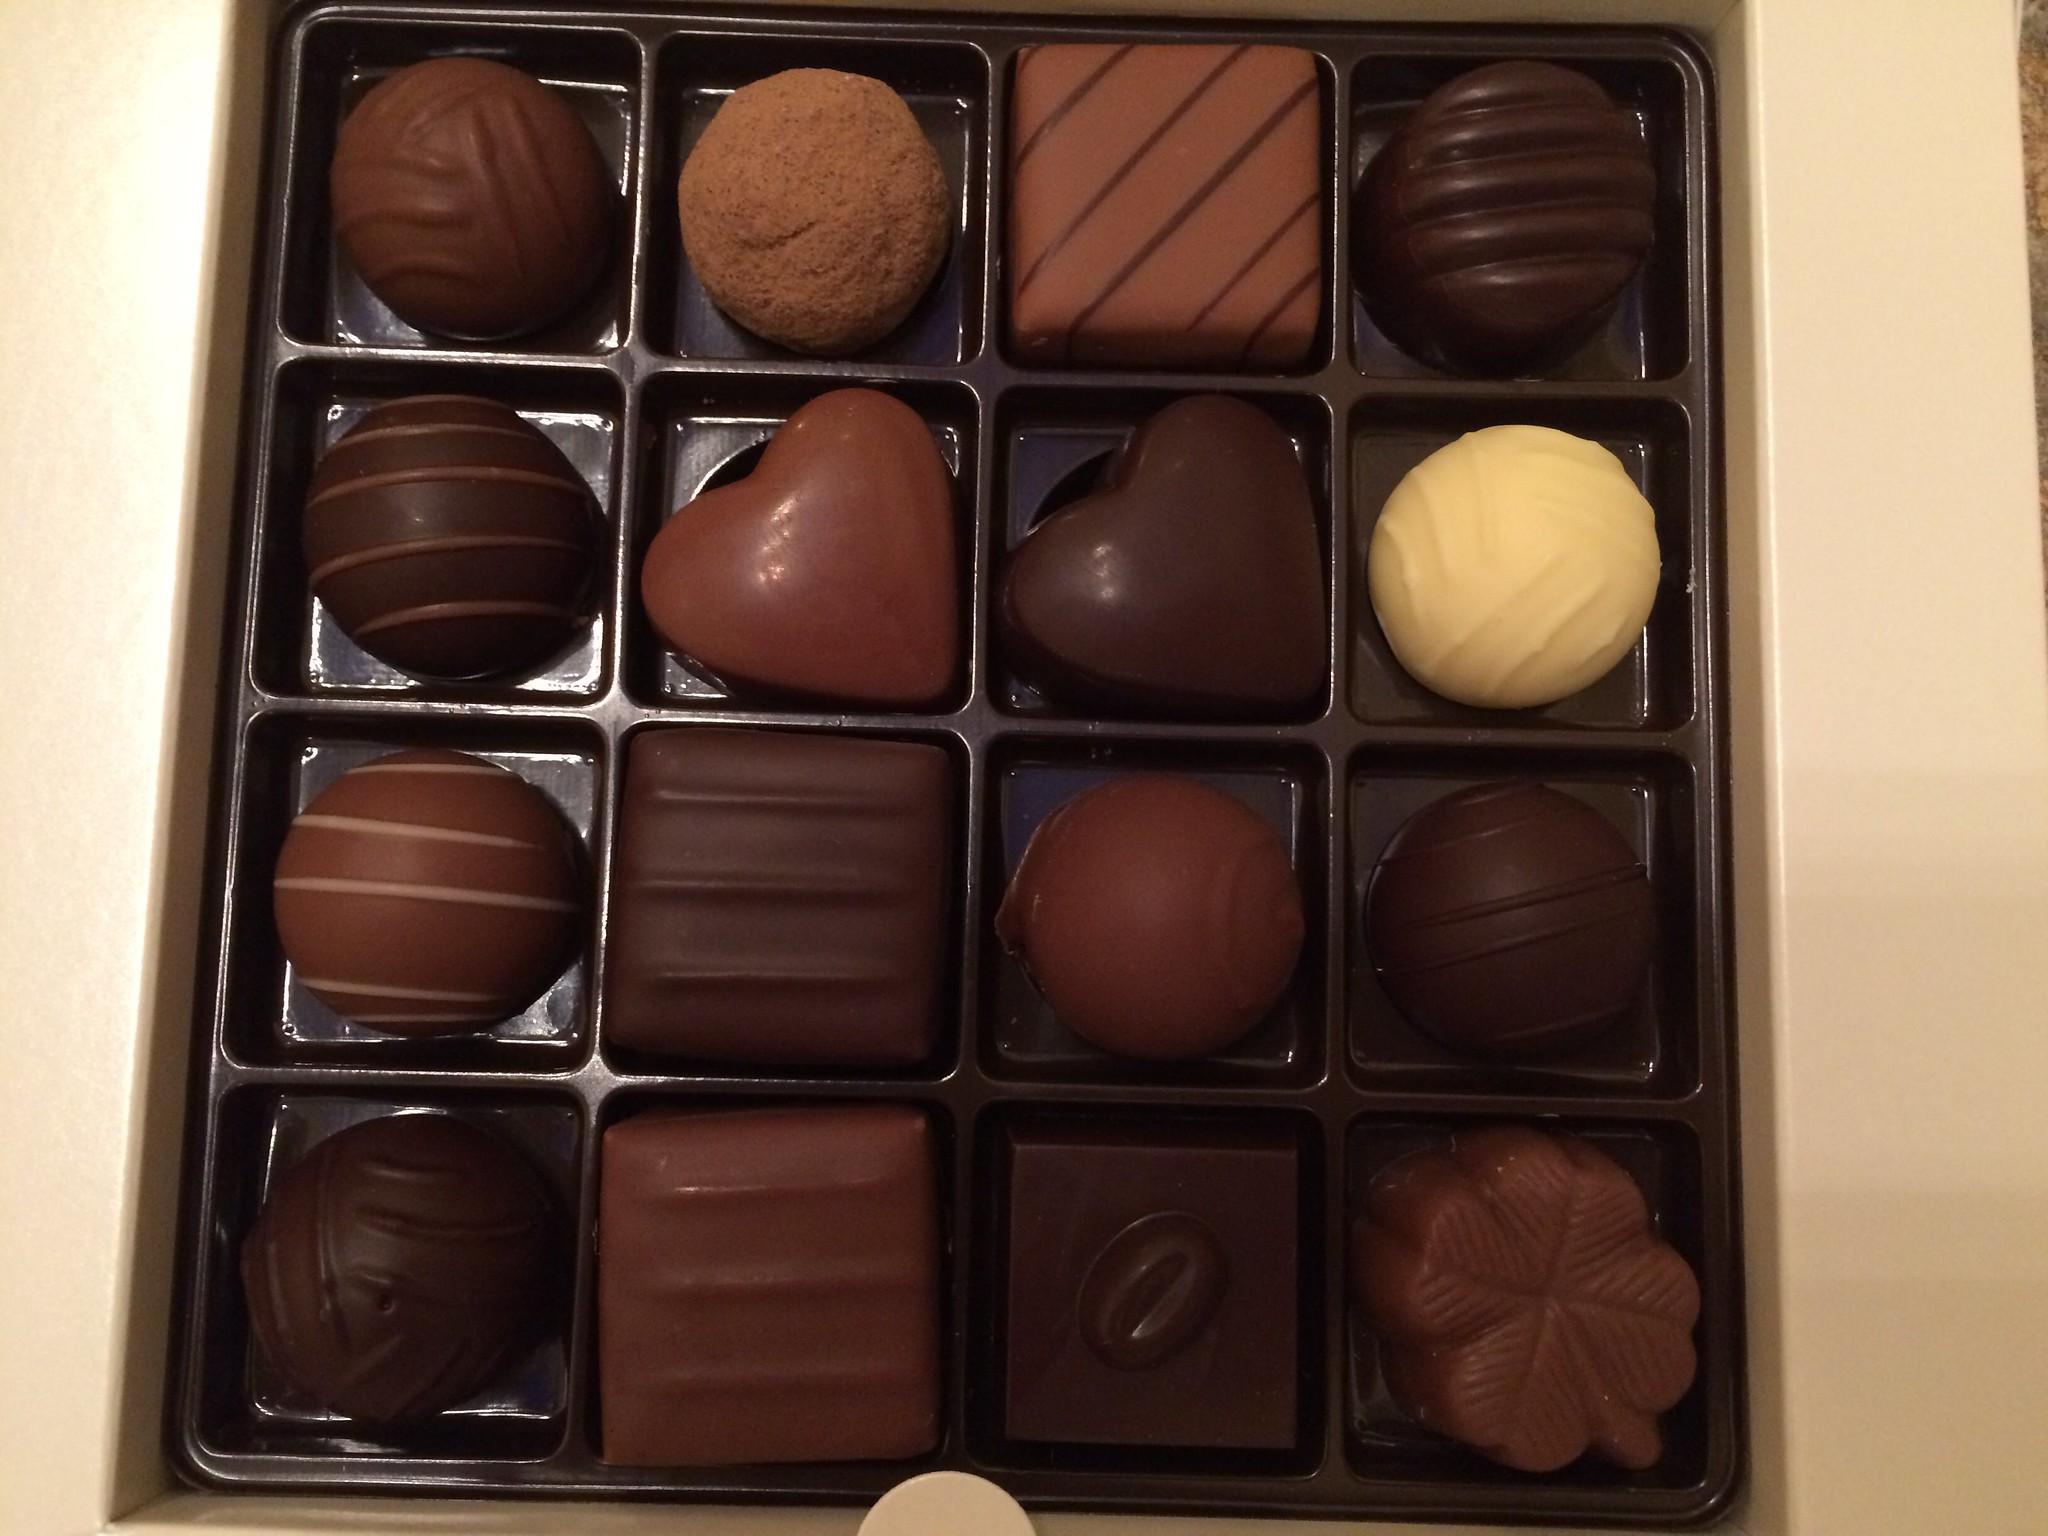 Holl's Chocolates